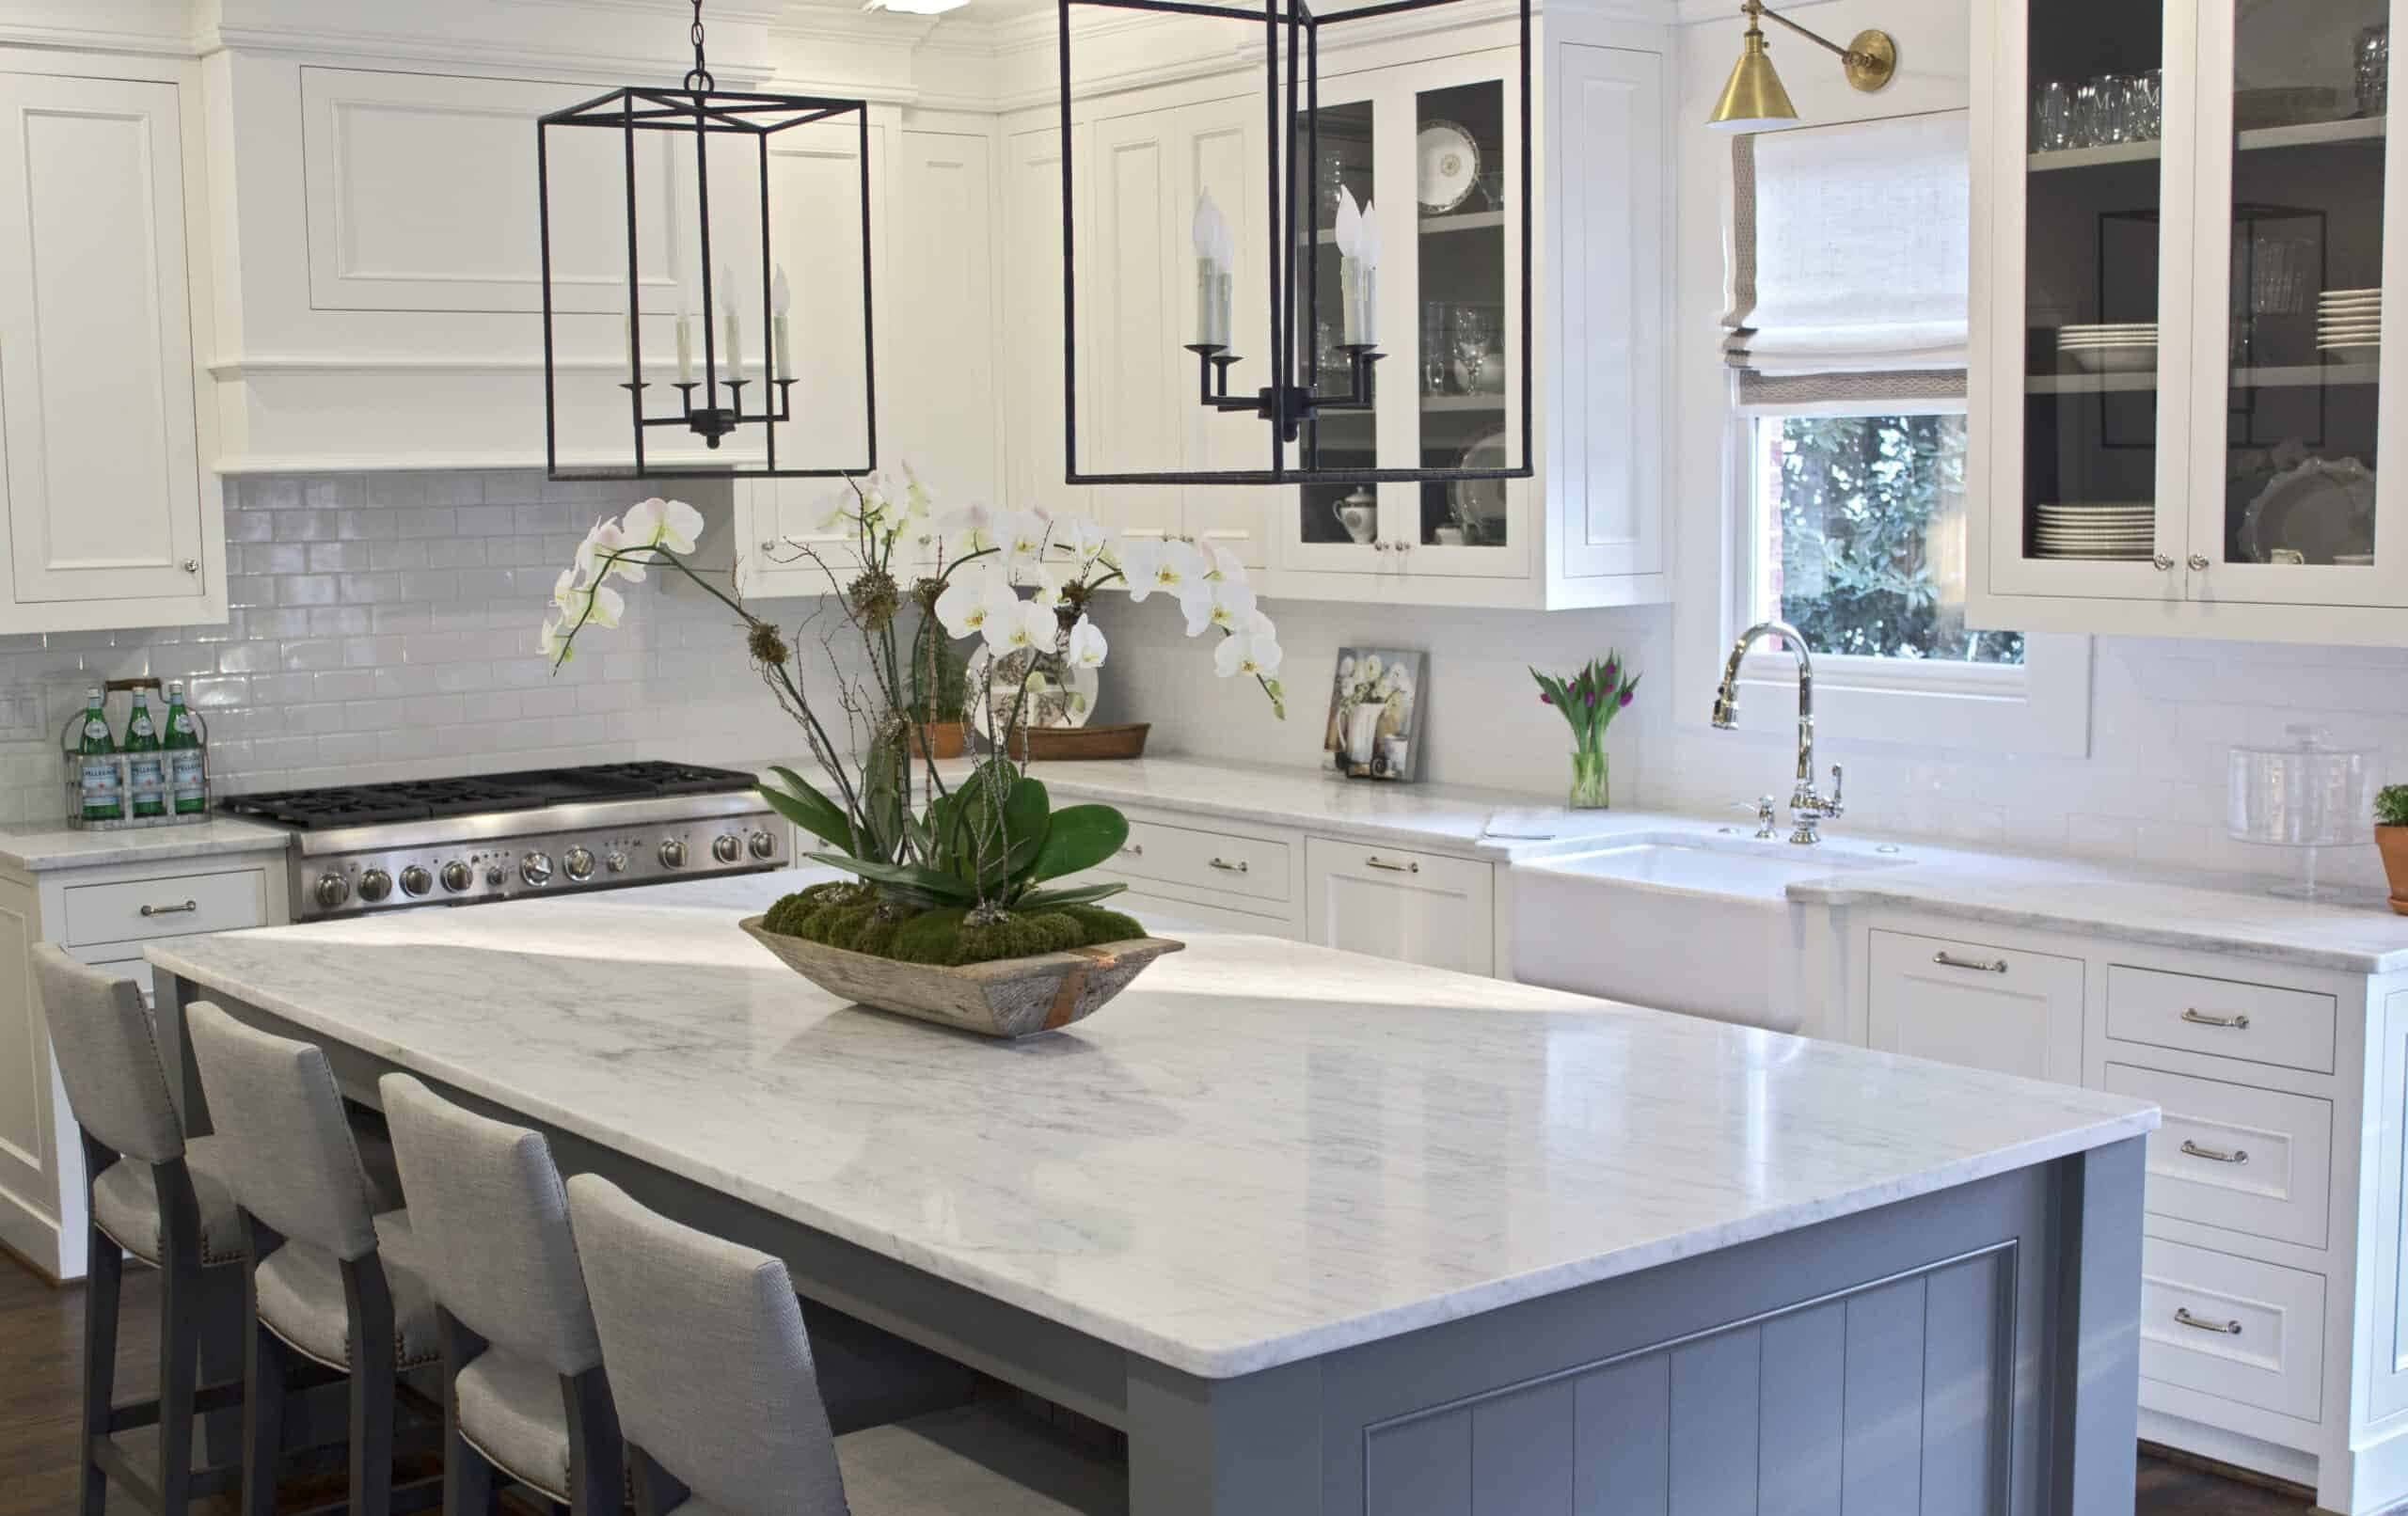 Kitchen1-cropped